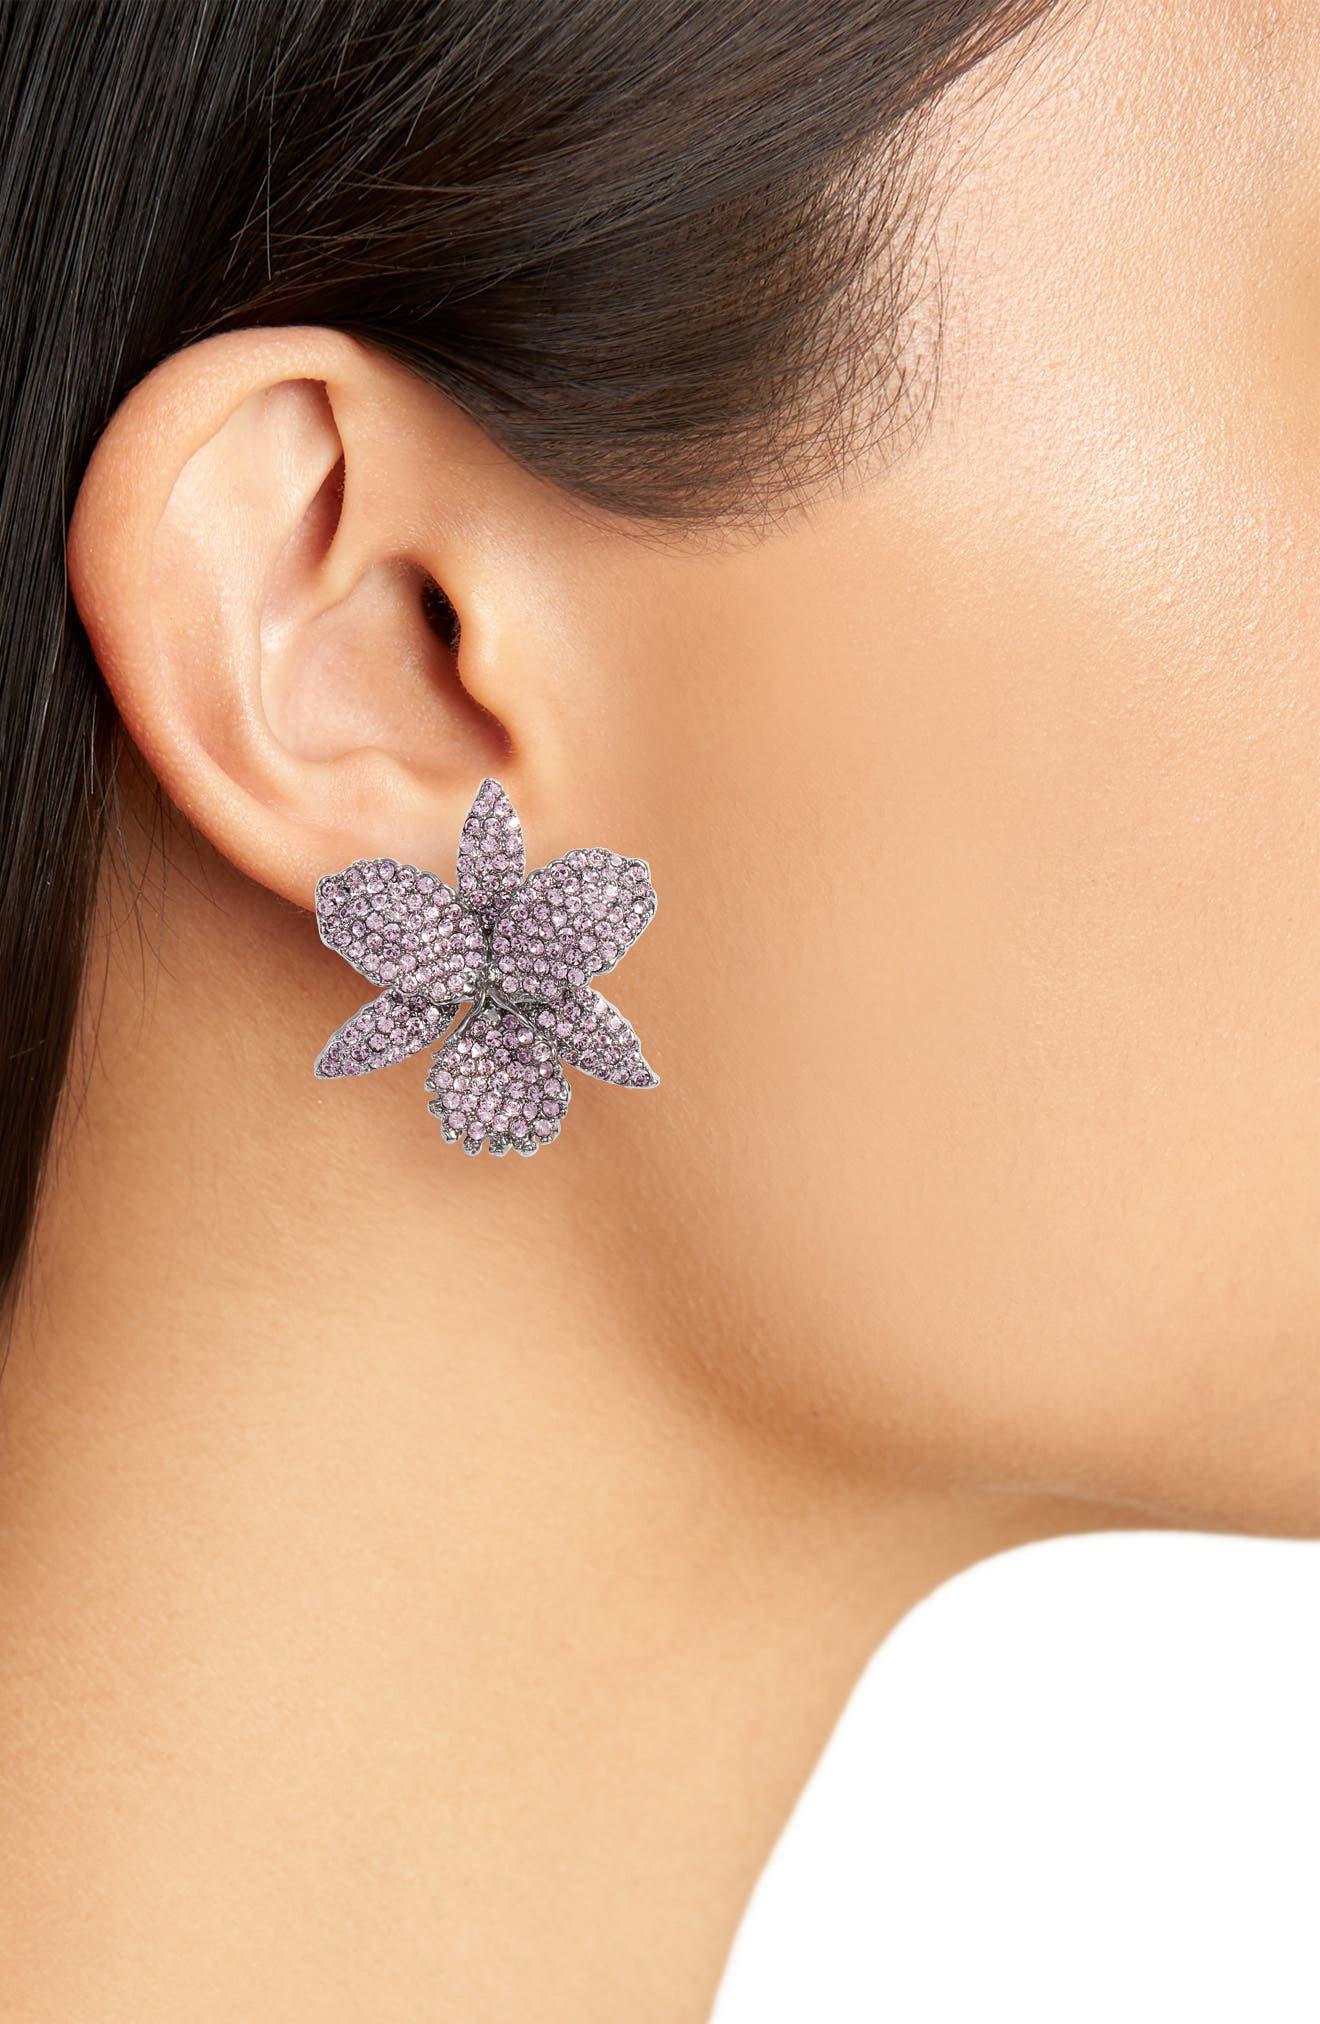 Large Orchid Swarovski Crystal Stud Earrings,                             Alternate thumbnail 2, color,                             BLACK/ LIGHT AMETHYST